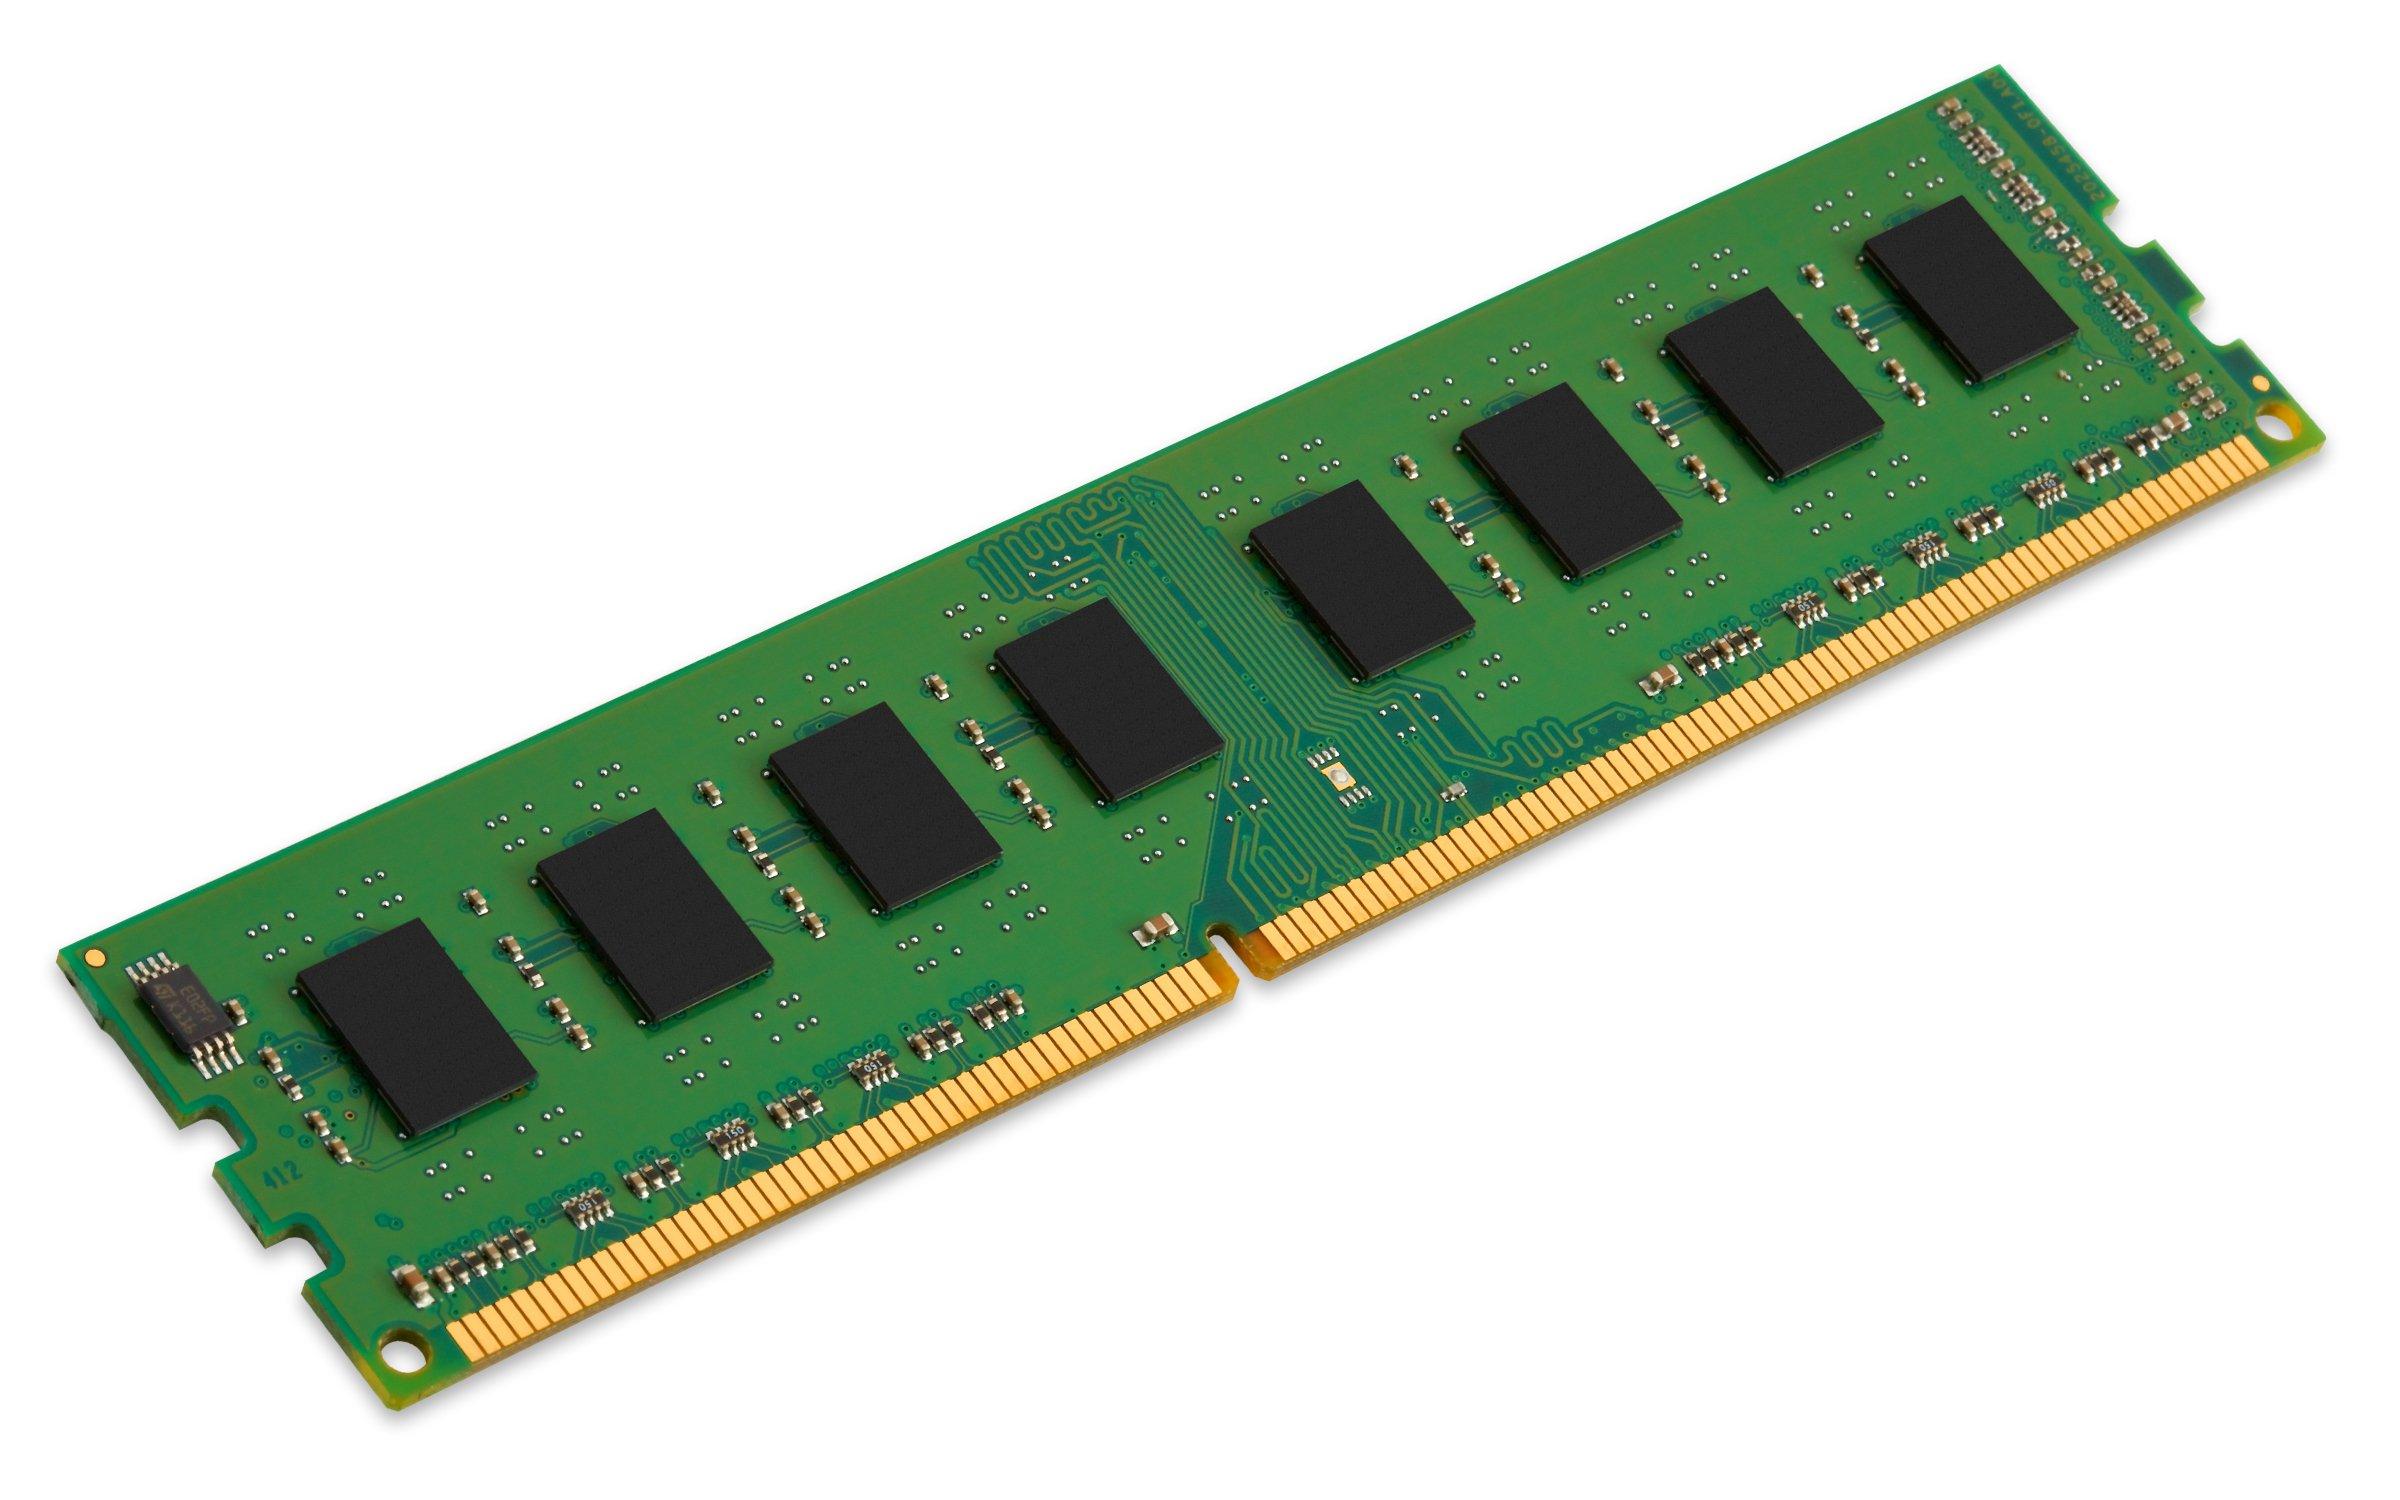 Memoria Ram 4gb Kingston Valueram 1333mhz Pc3-10600 Ddr3 Non-ecc Cl9 Dimm Sr X8 Std Height 30mm (kvr13n9s8h/4)